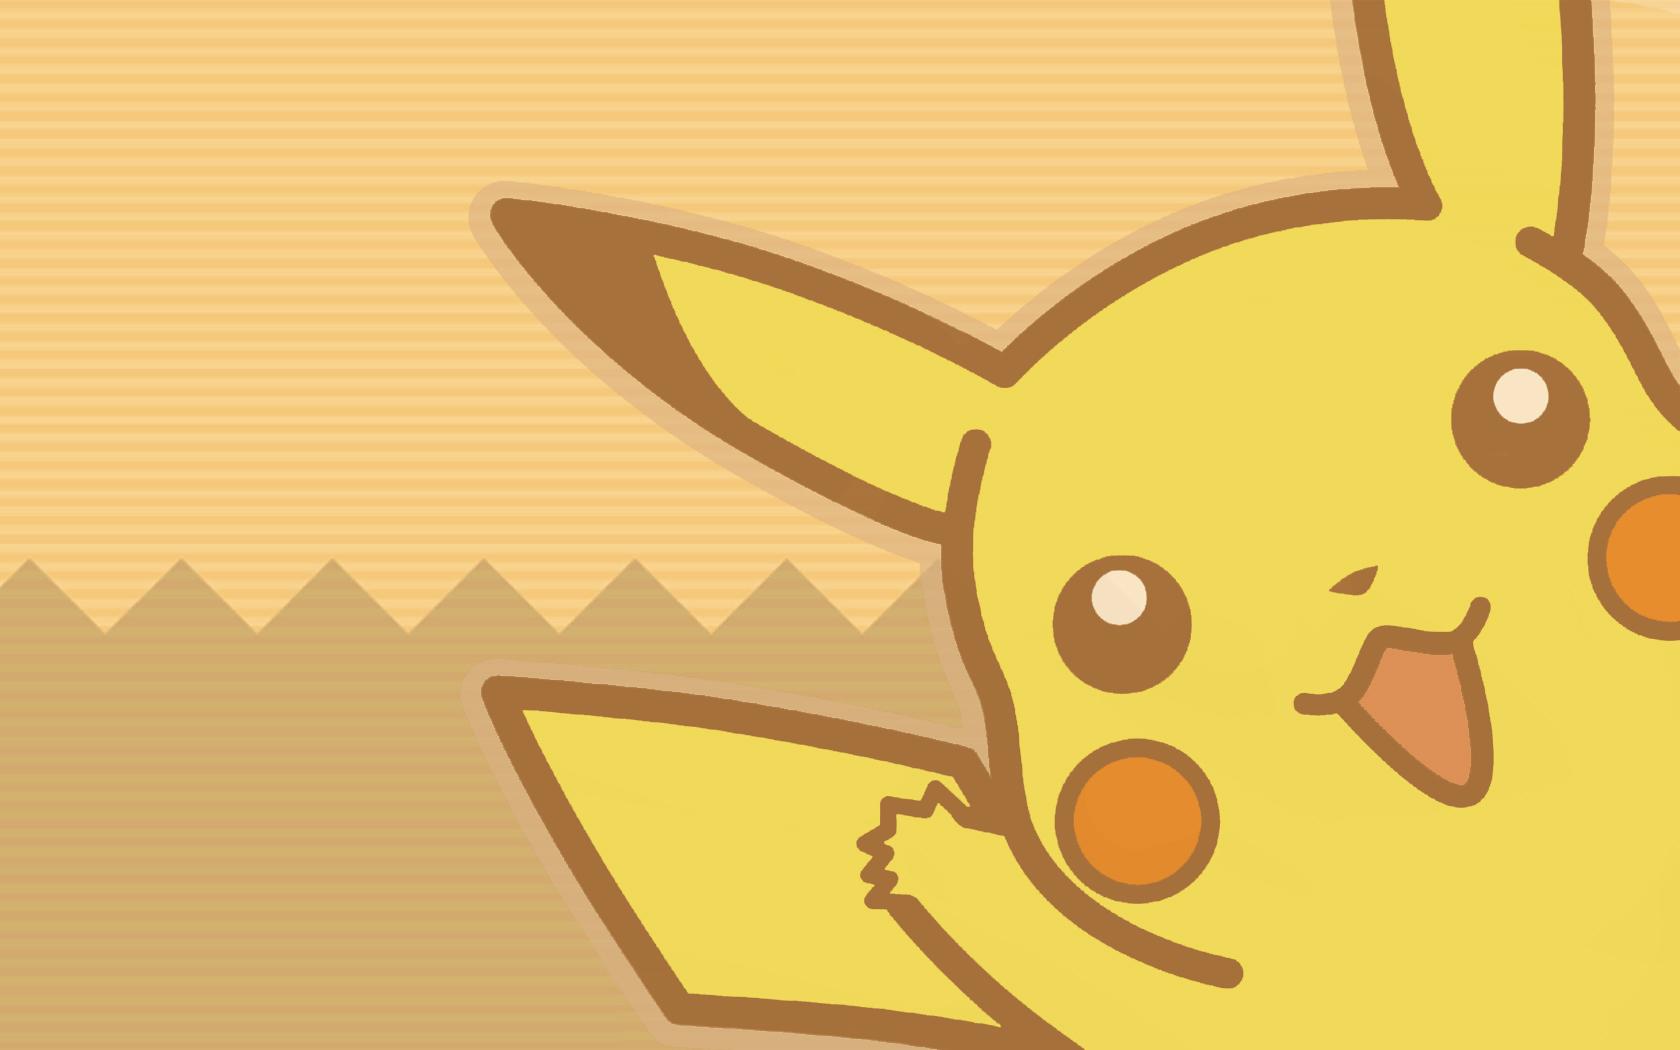 Pikachu   Pokemon 4 Desktop Background   Trendy Wallpapers 1680x1050